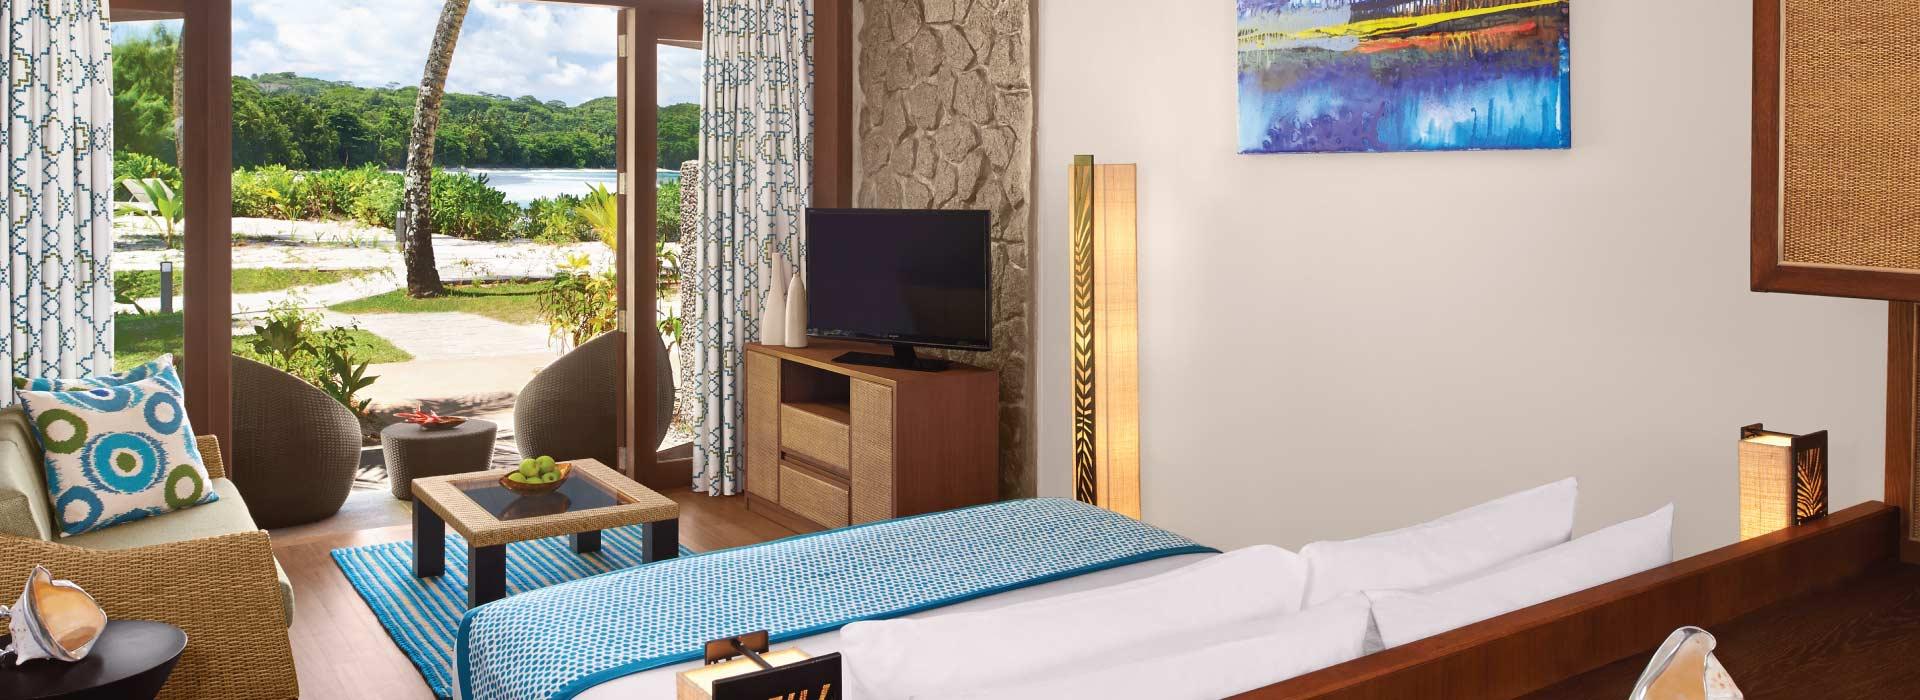 Seychelles Beach Resort ocean view room